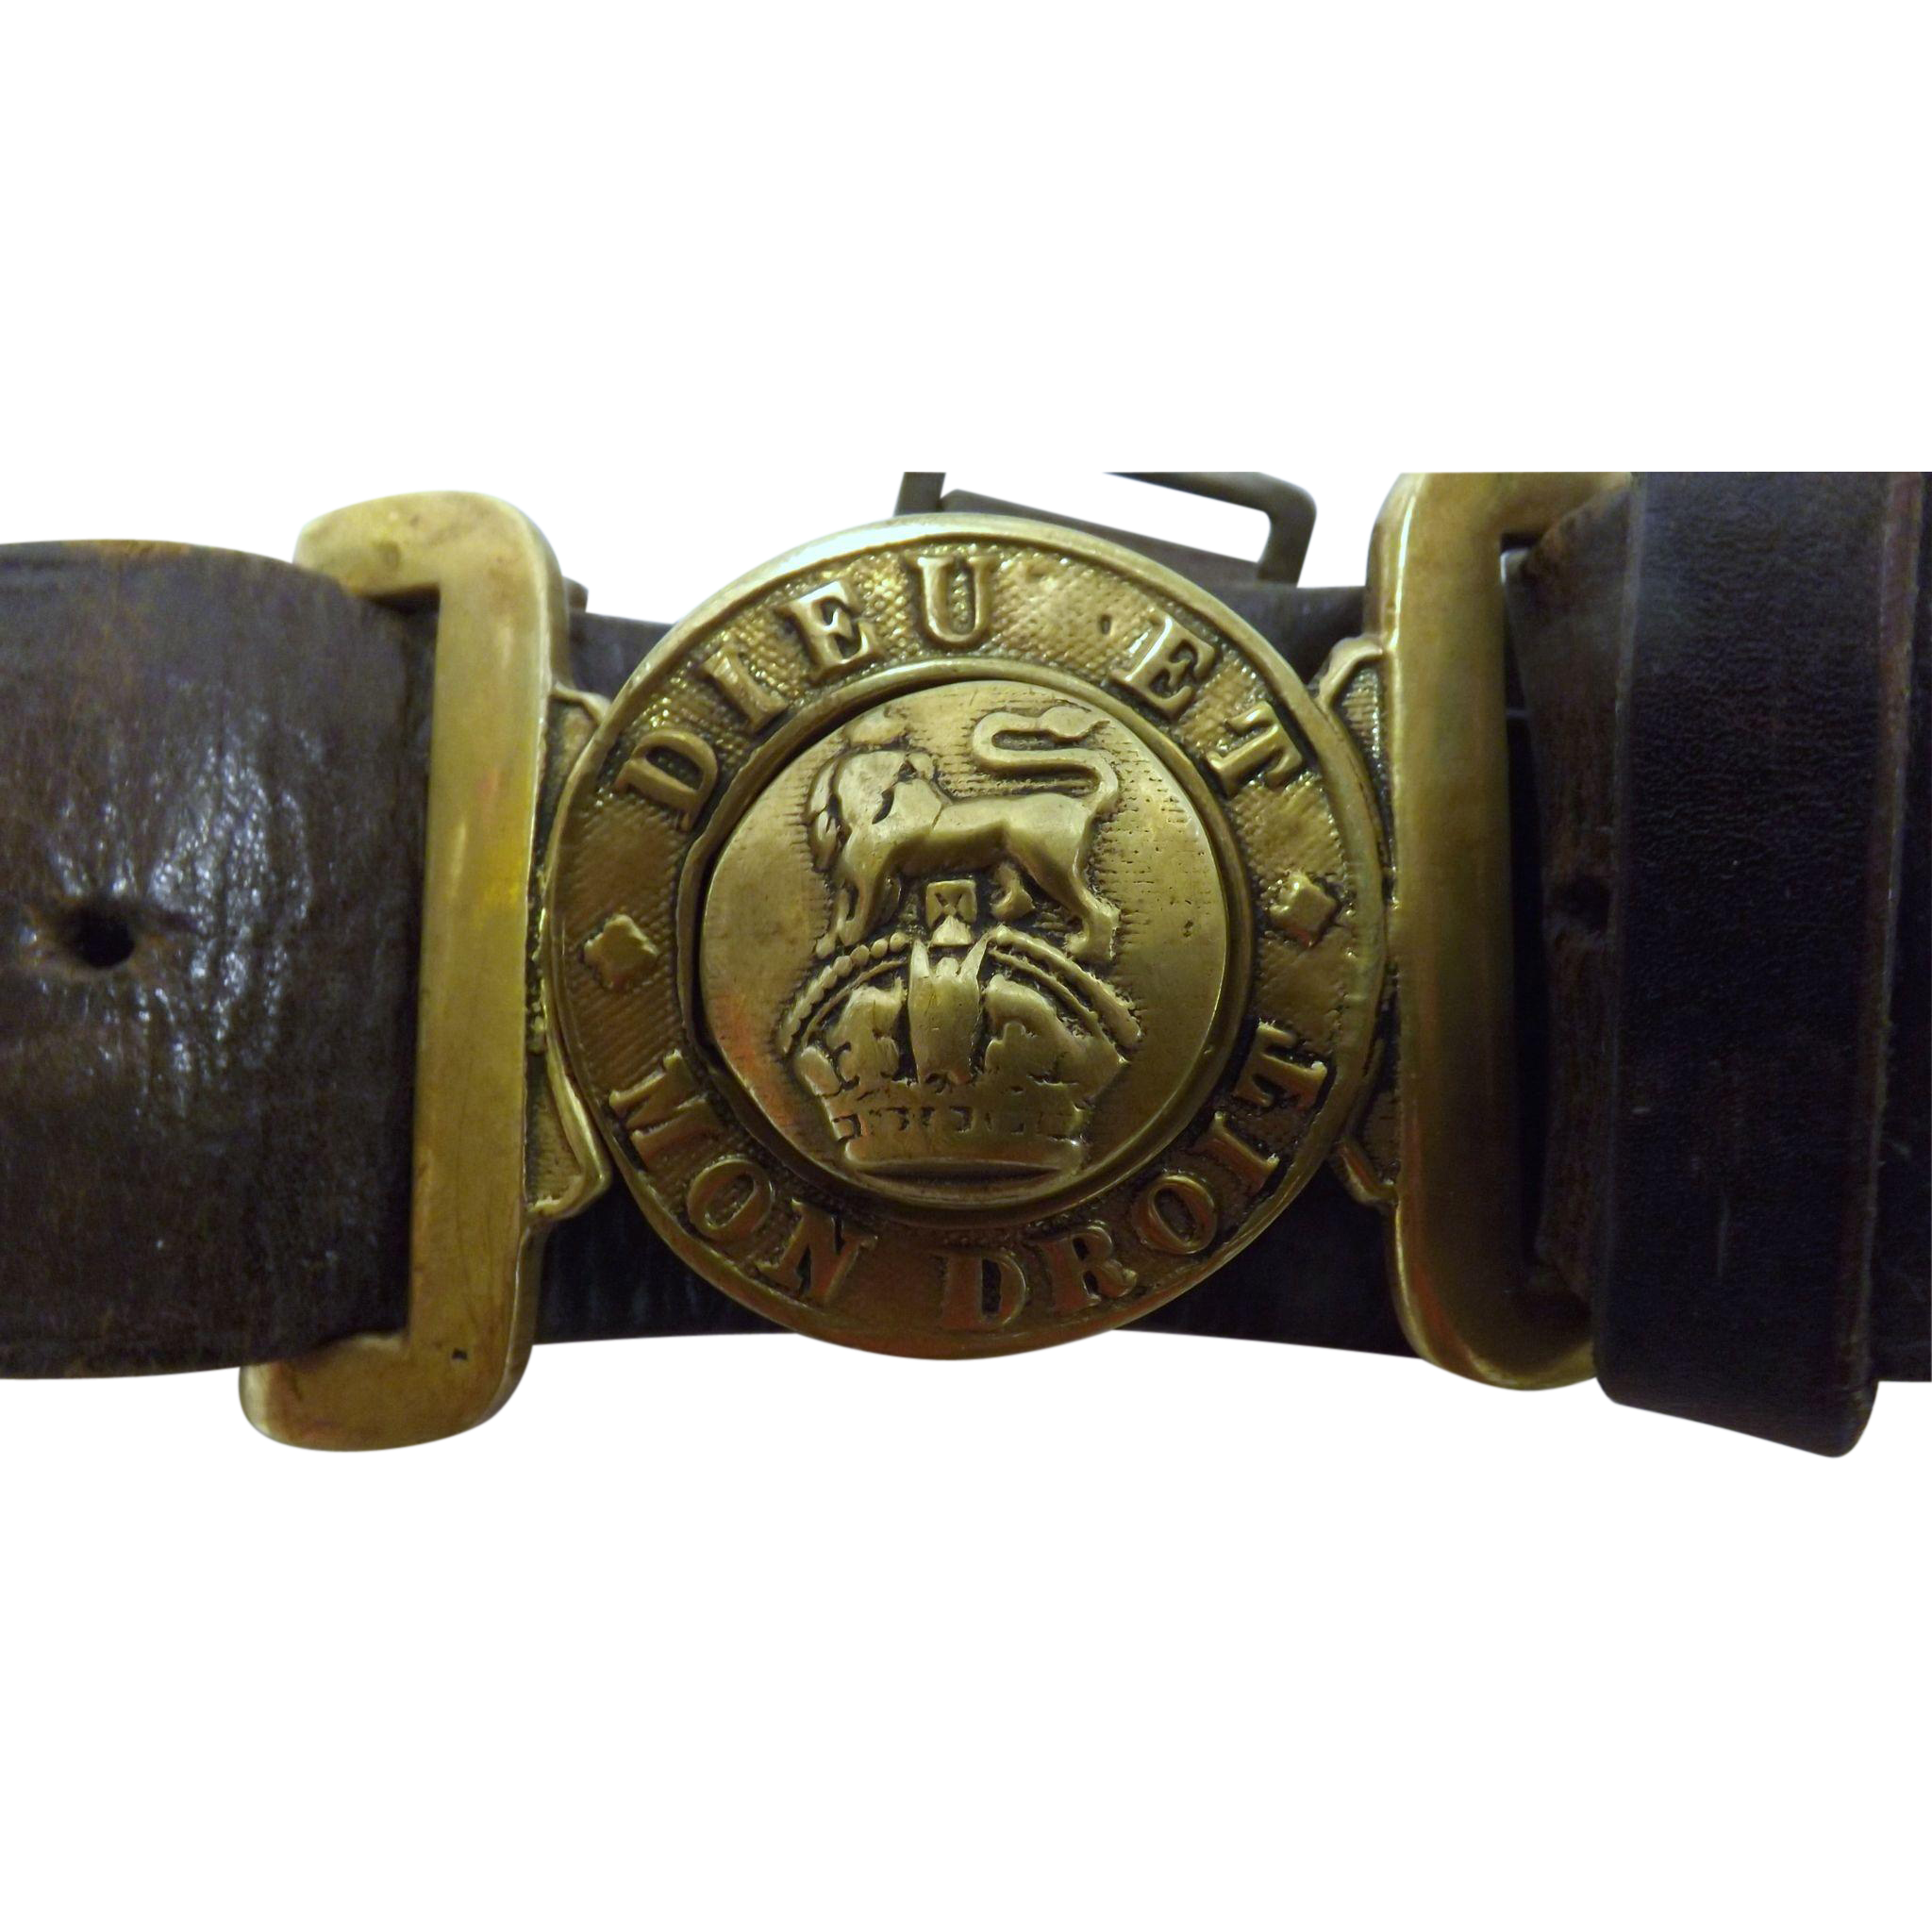 British Army Officers WW1 Belt & Buckle